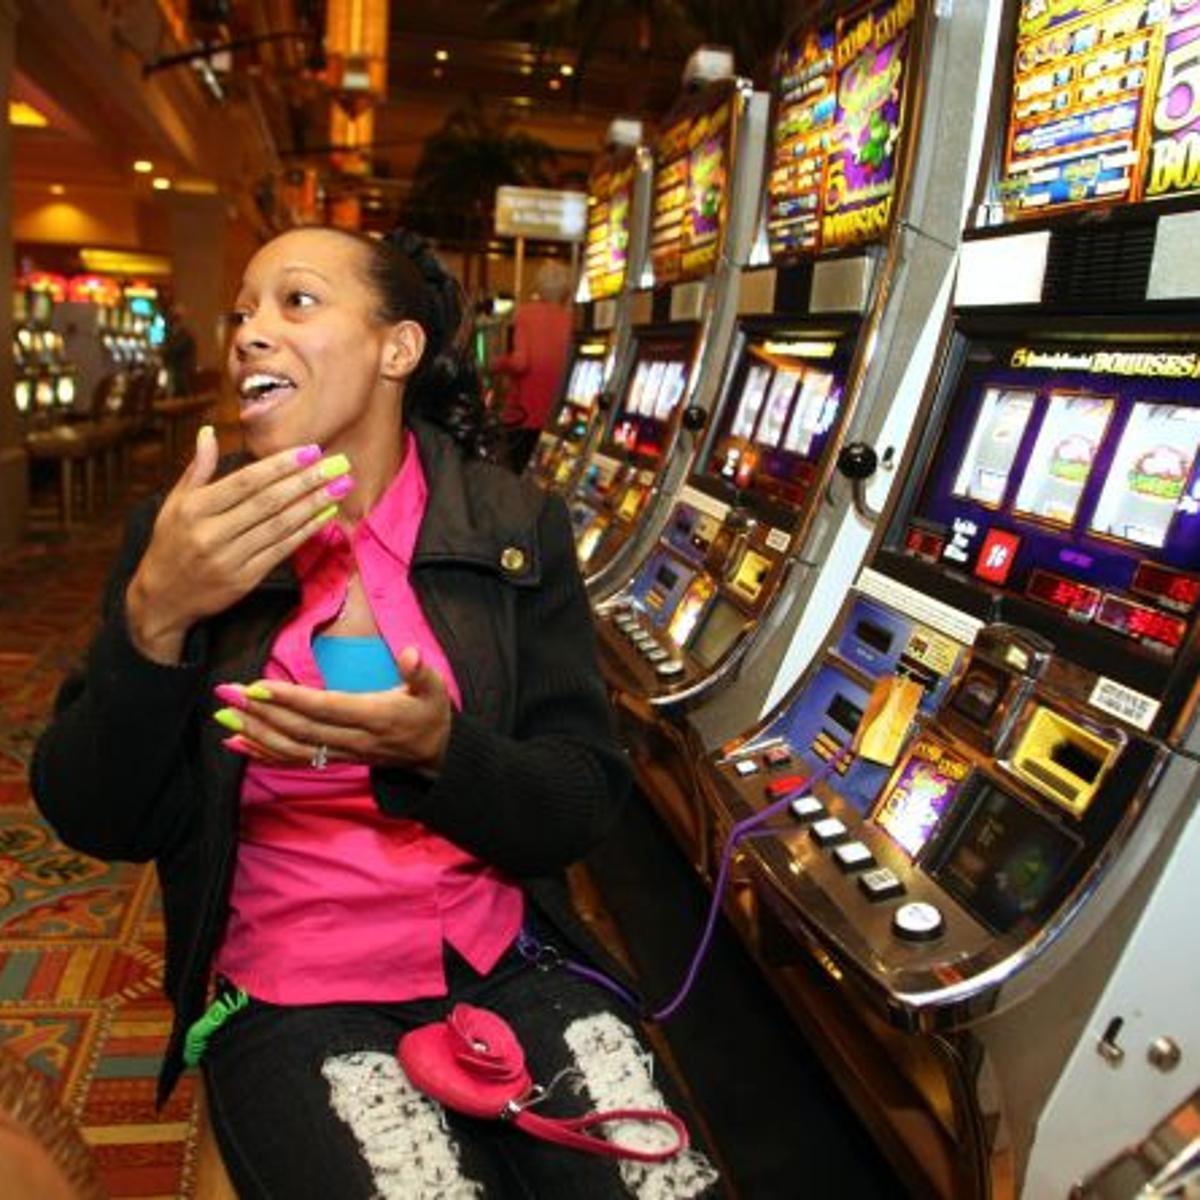 Penny slots are popular, flexible and profitable, so they're gaining more  space on casino floors | Latest Headlines | pressofatlanticcity.com